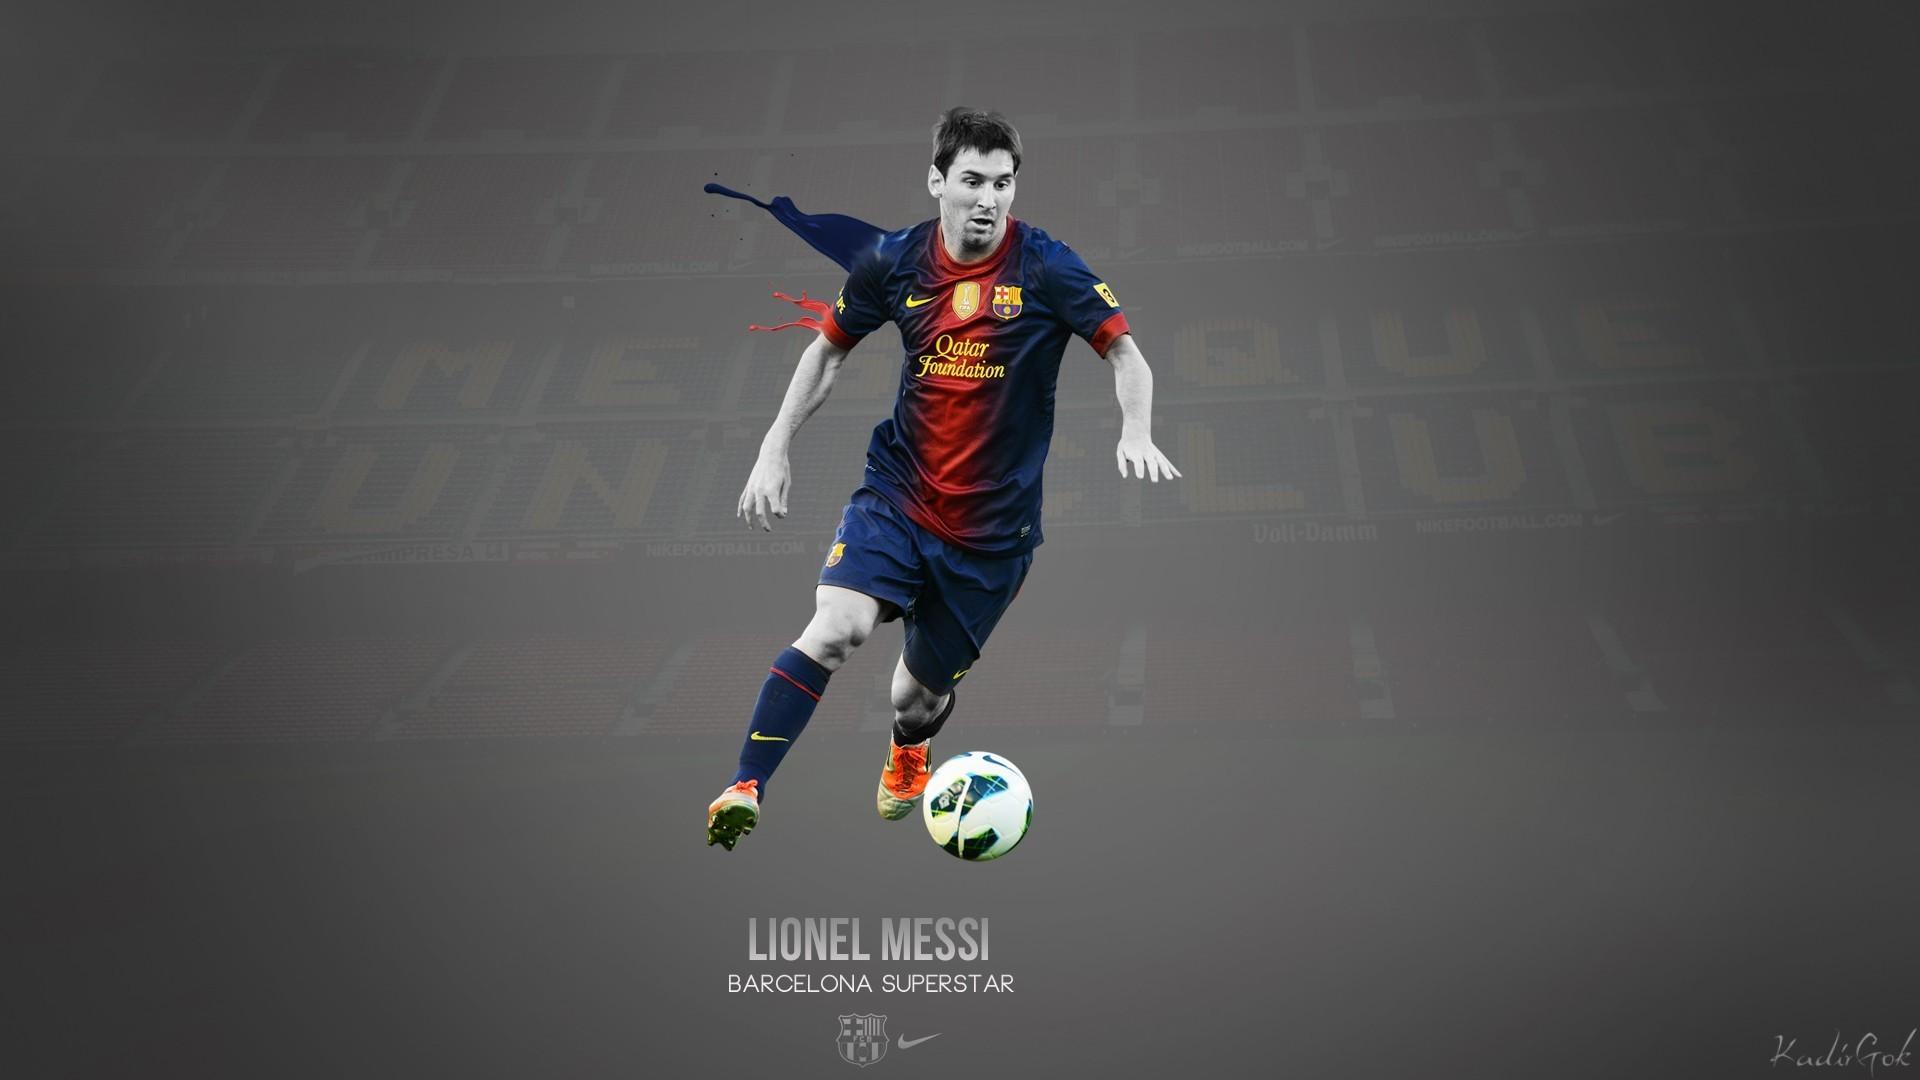 Great Lionel Messi 2015 New Hd Wallpaper – FC Barcelona Wallpaper HD 2017  FFG1